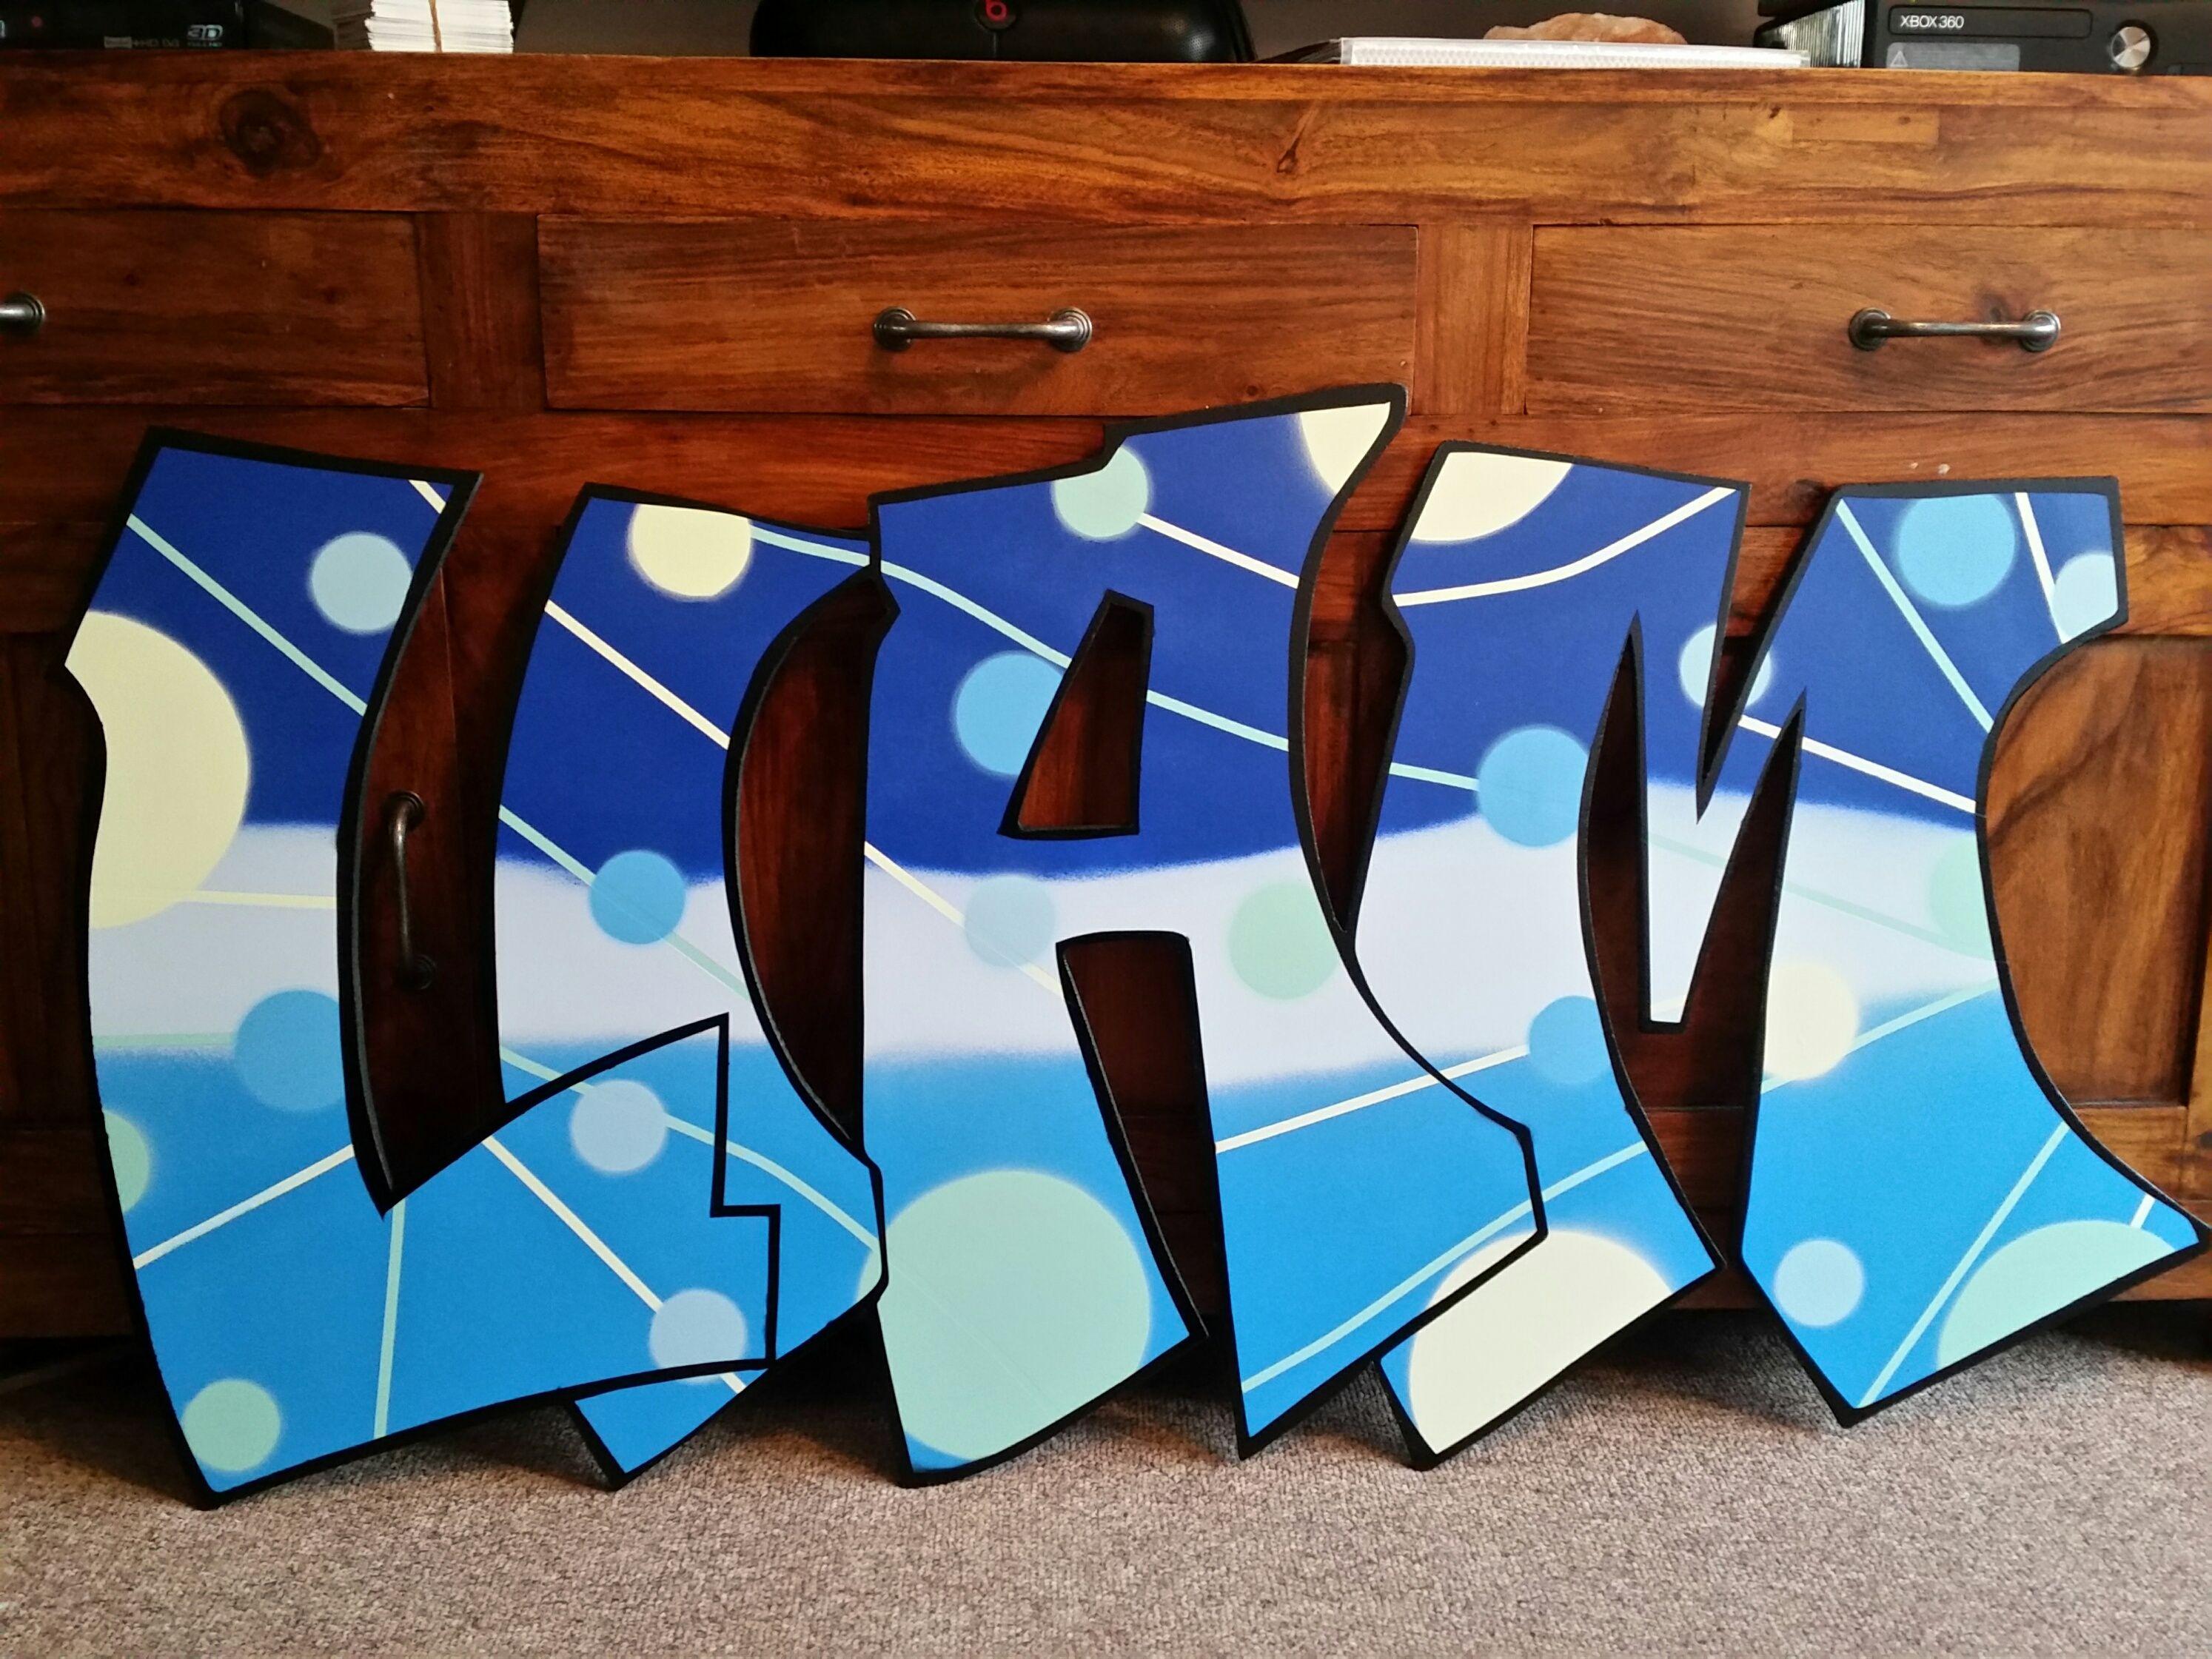 Graffiti art on wood - Liam Graffiti Name